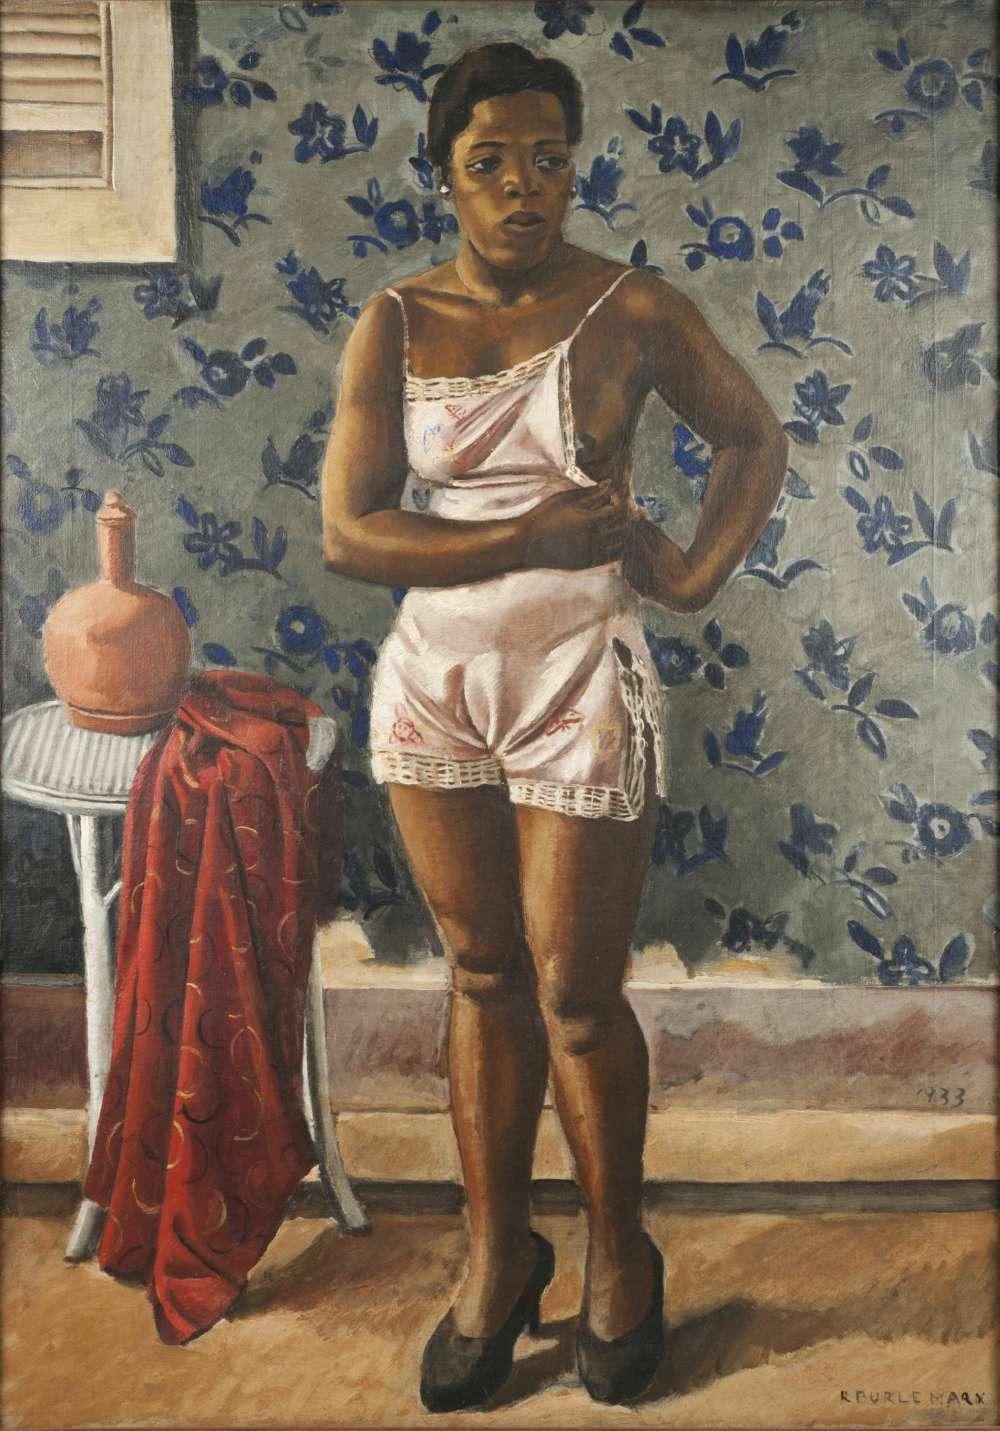 Roberto Burle Marx, Woman in a Pink Slip, 1933, oil on canvas, 39 æ x 28 in. (101 x 71.1 cm). SÌtio Roberto Burle Marx, Rio de Janeiro.